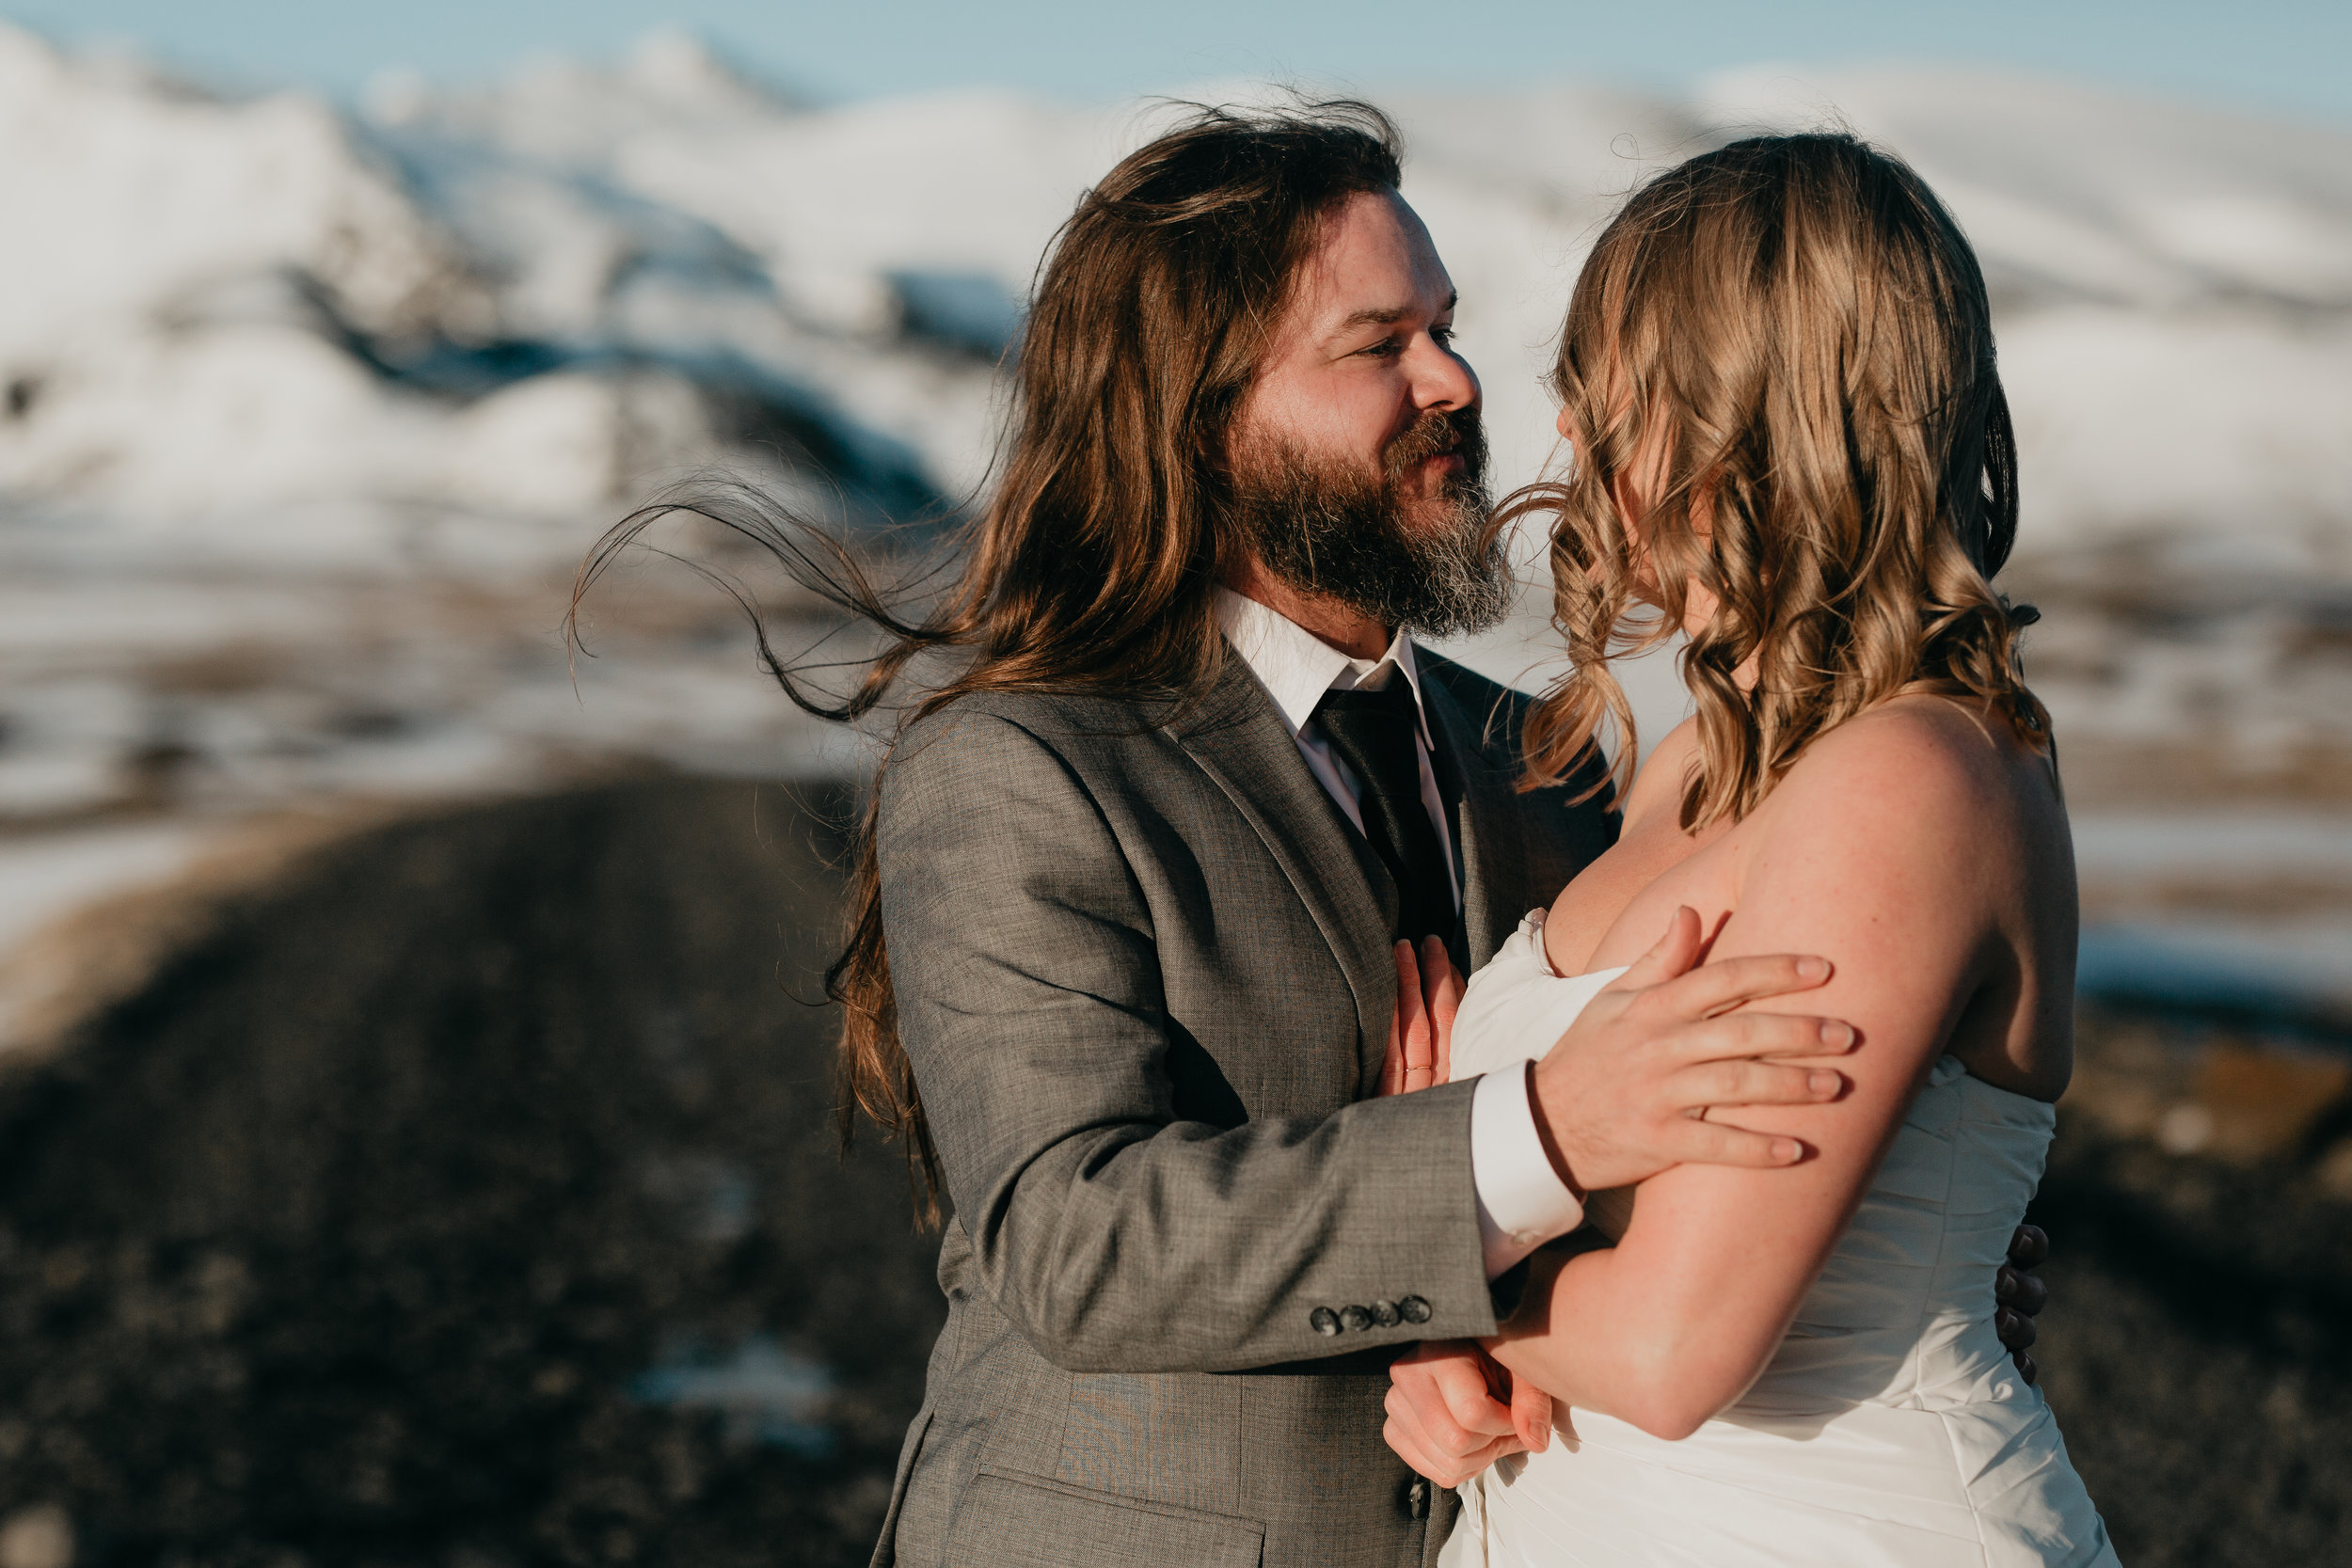 nicole-daacke-photography-iceland-winter-sunset-adventure-elopement-skogafoss-waterfall-black-sand-beach-dyrholaey-vik-iceland-intimate-wedding-black-church-elopement-photographer-20.jpg